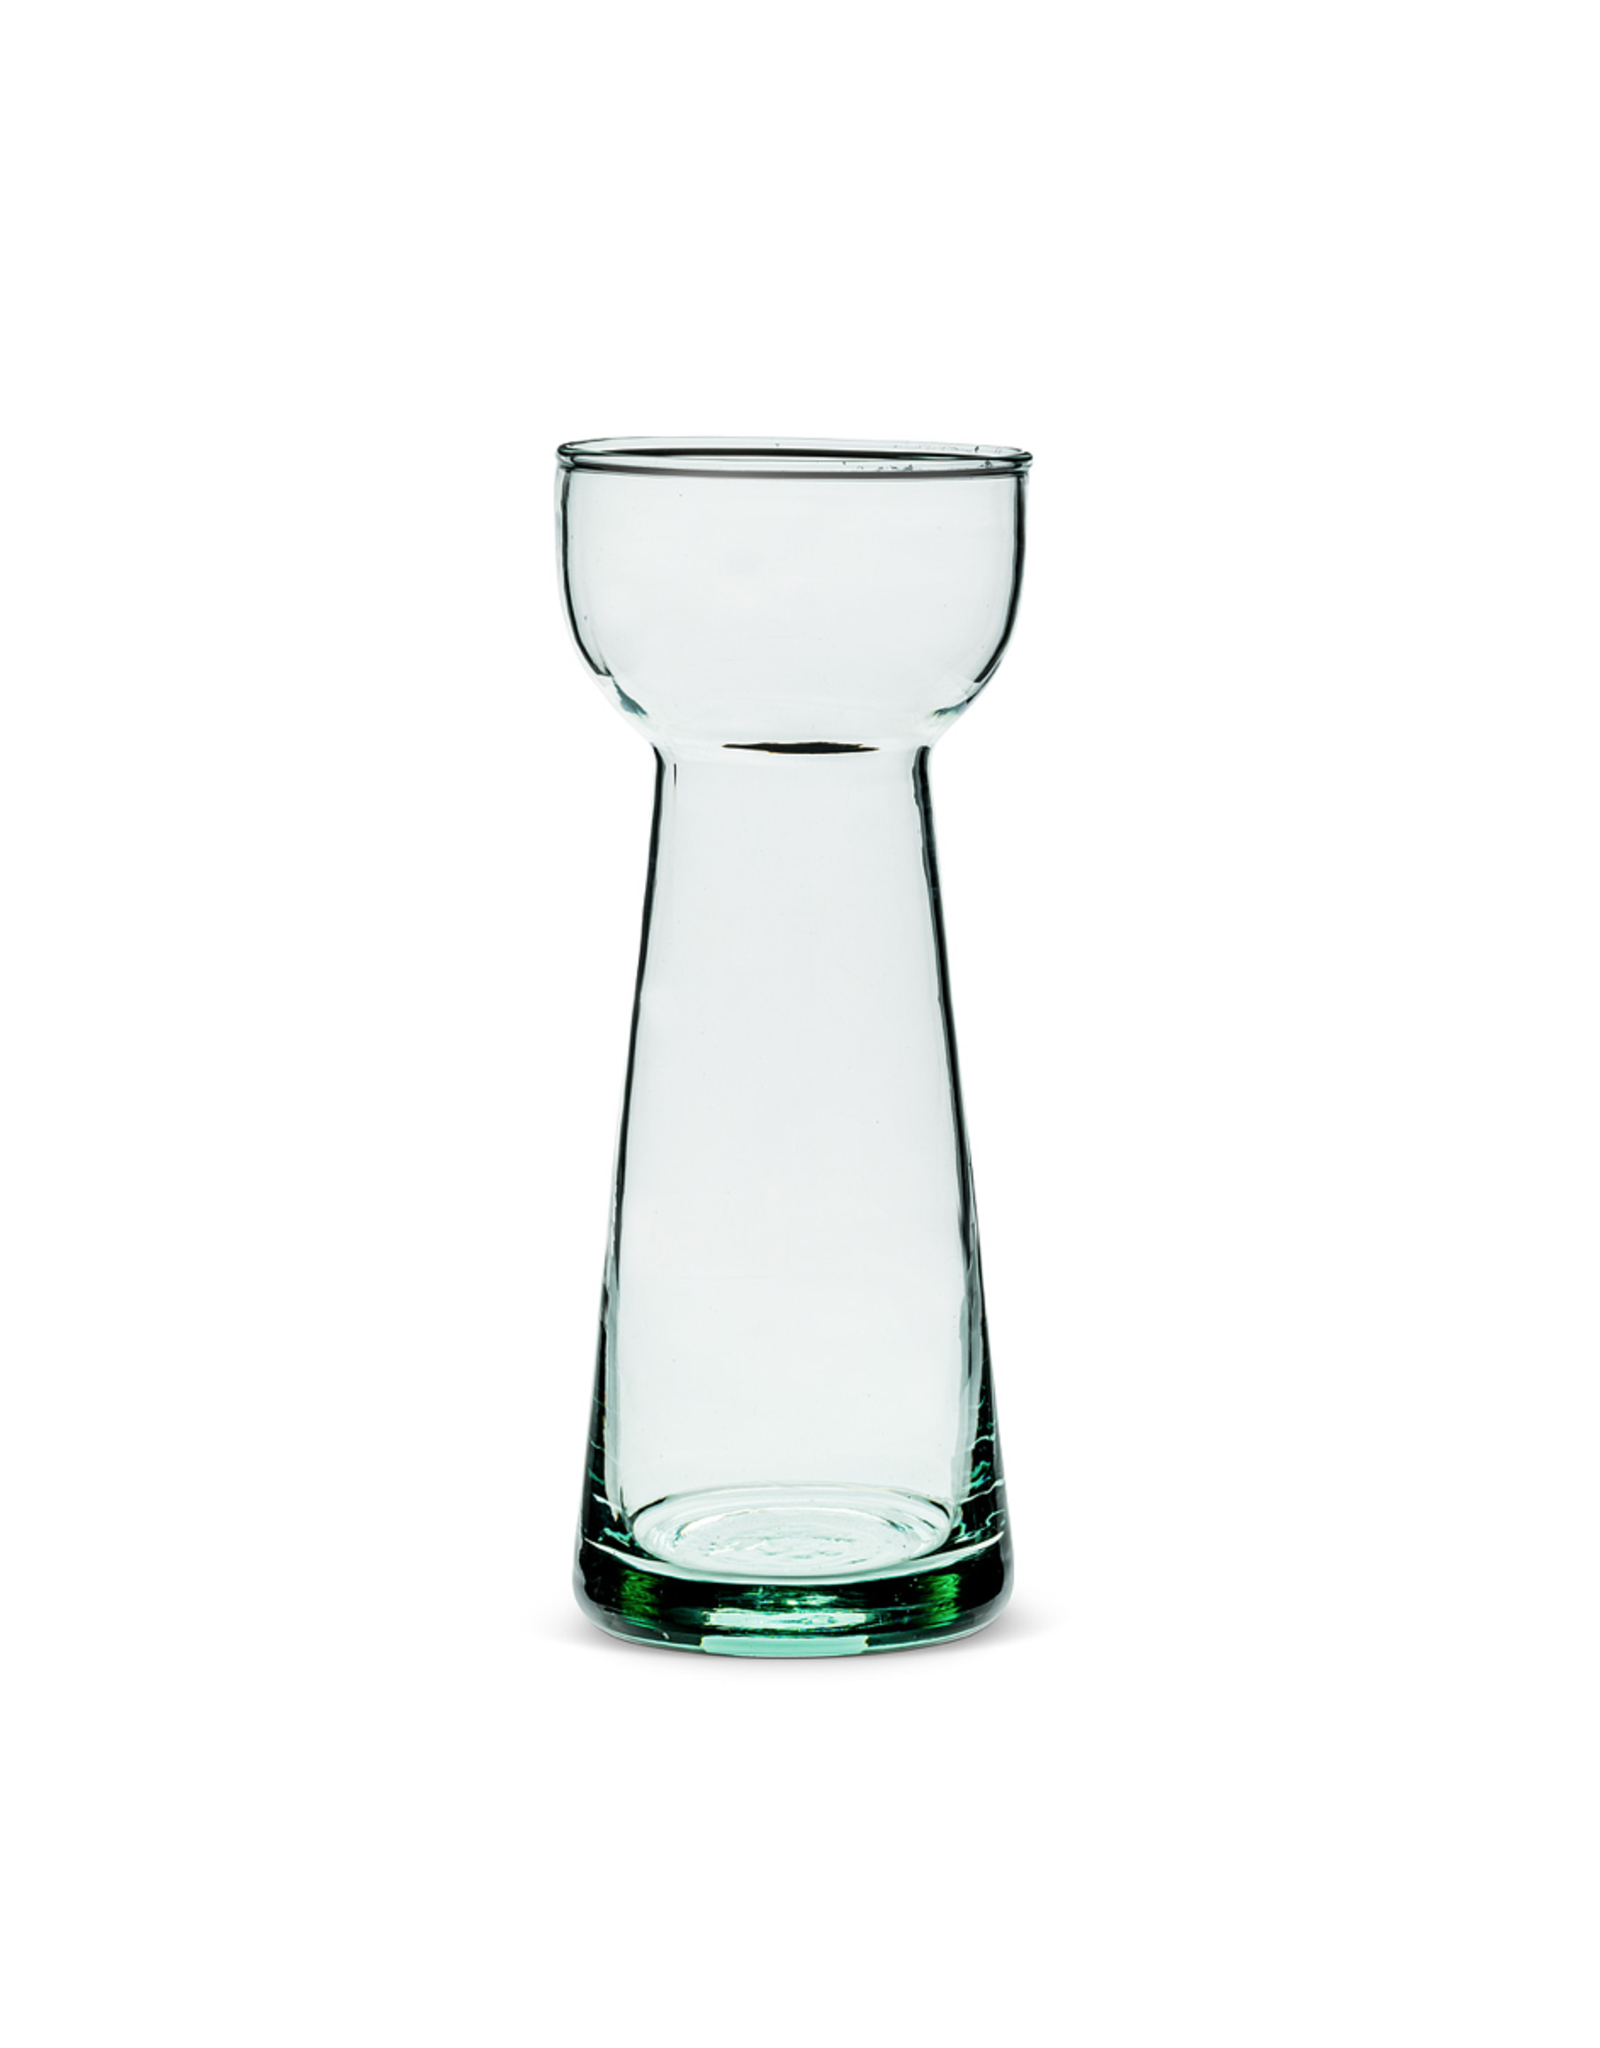 ATT - Vase/Mid Century, Recycled Glass